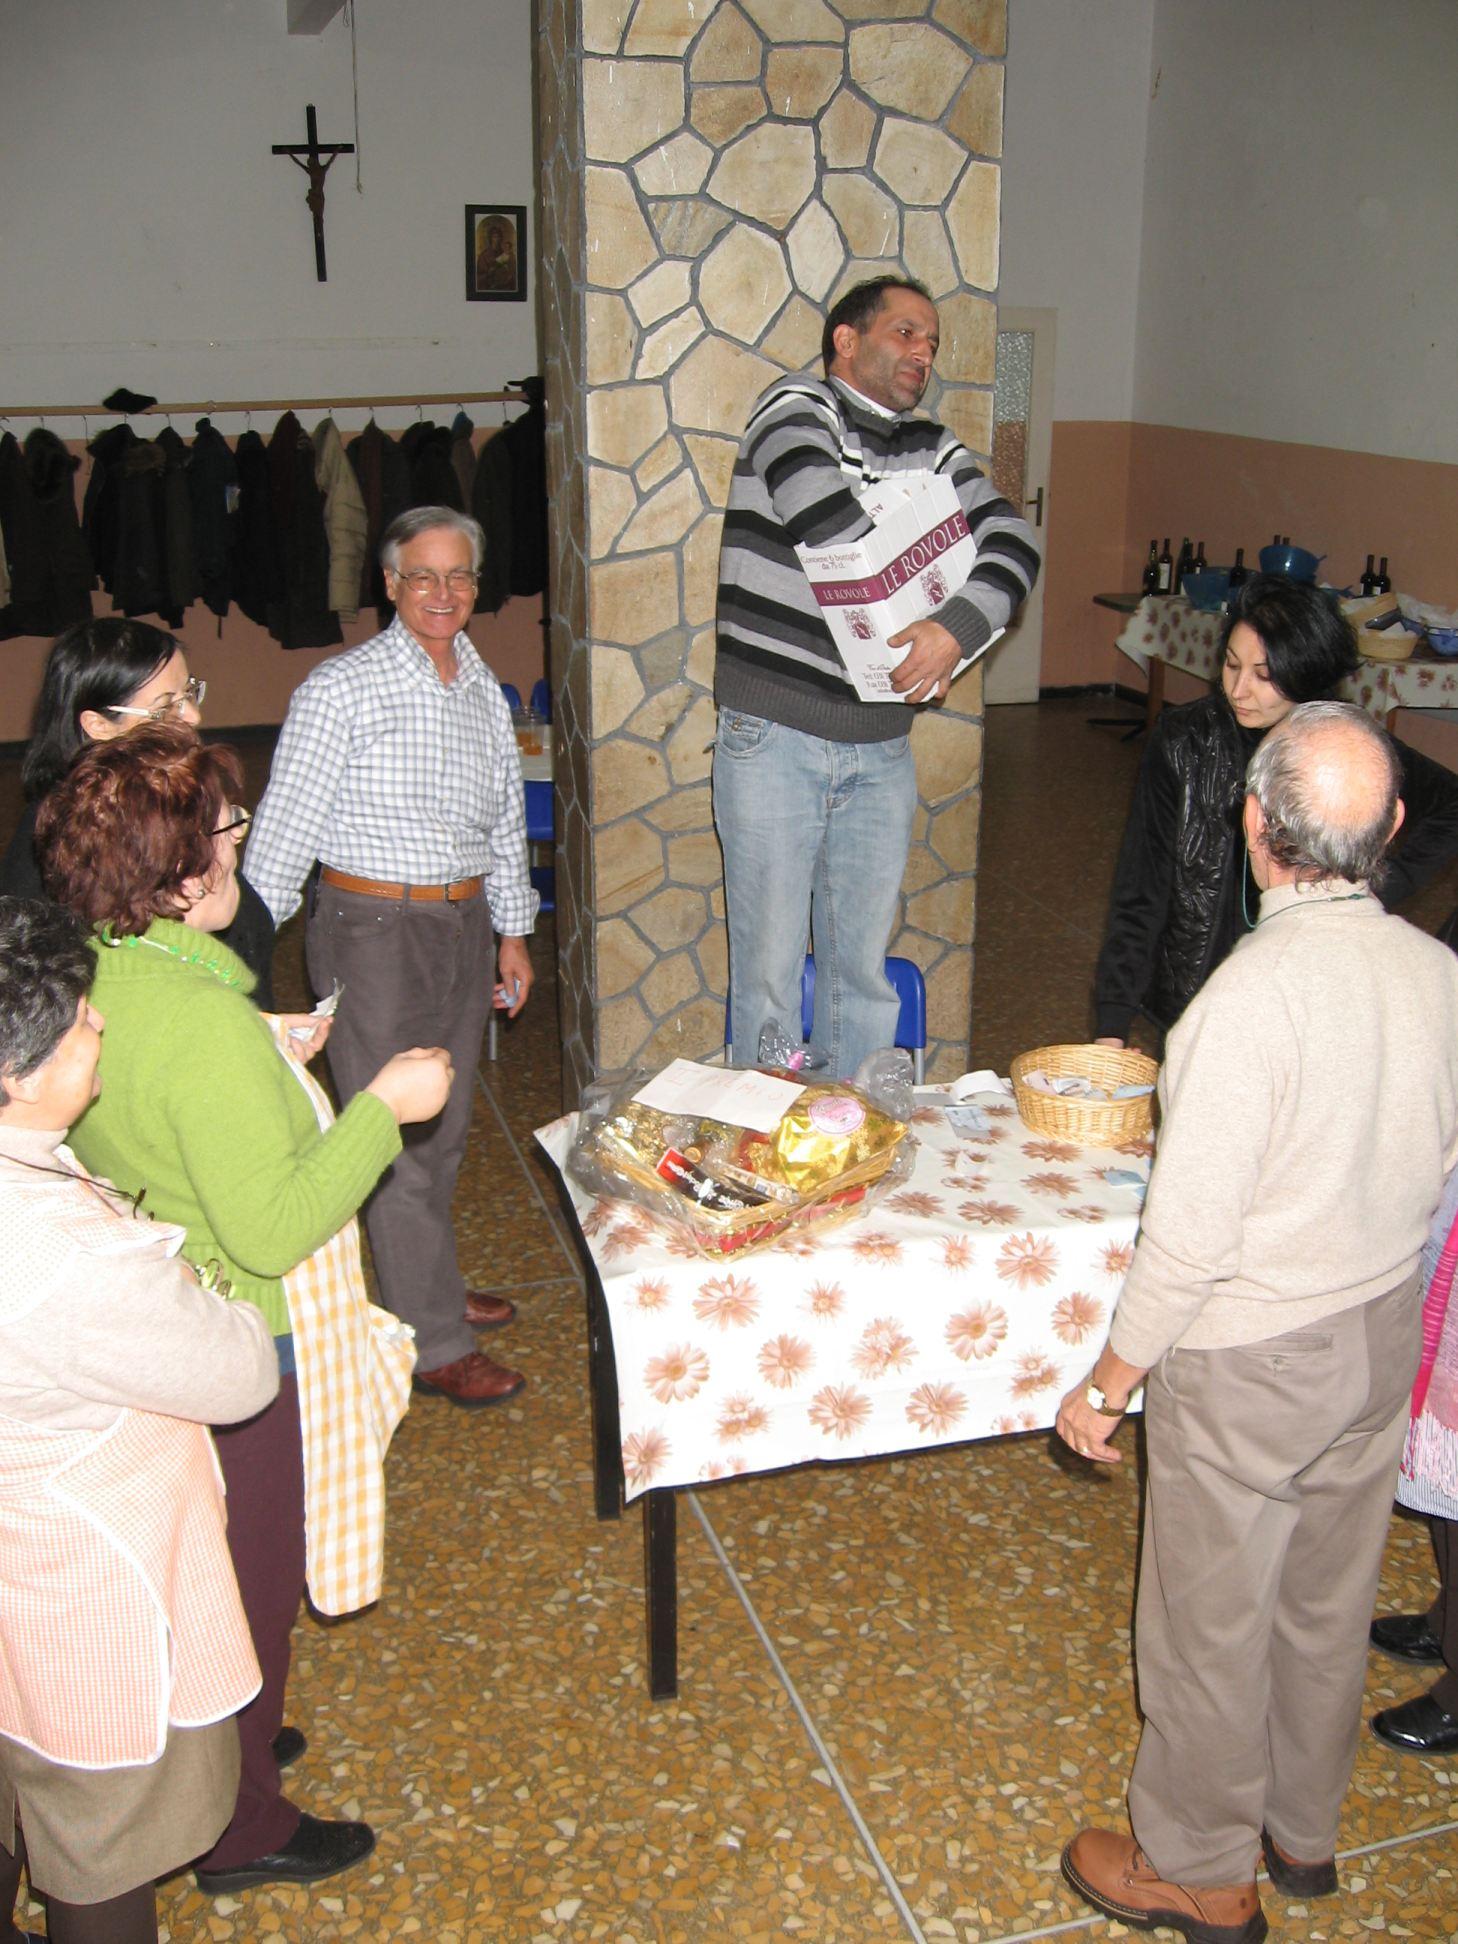 Pranzo_Comunitario-2009-12-19--14.48.56